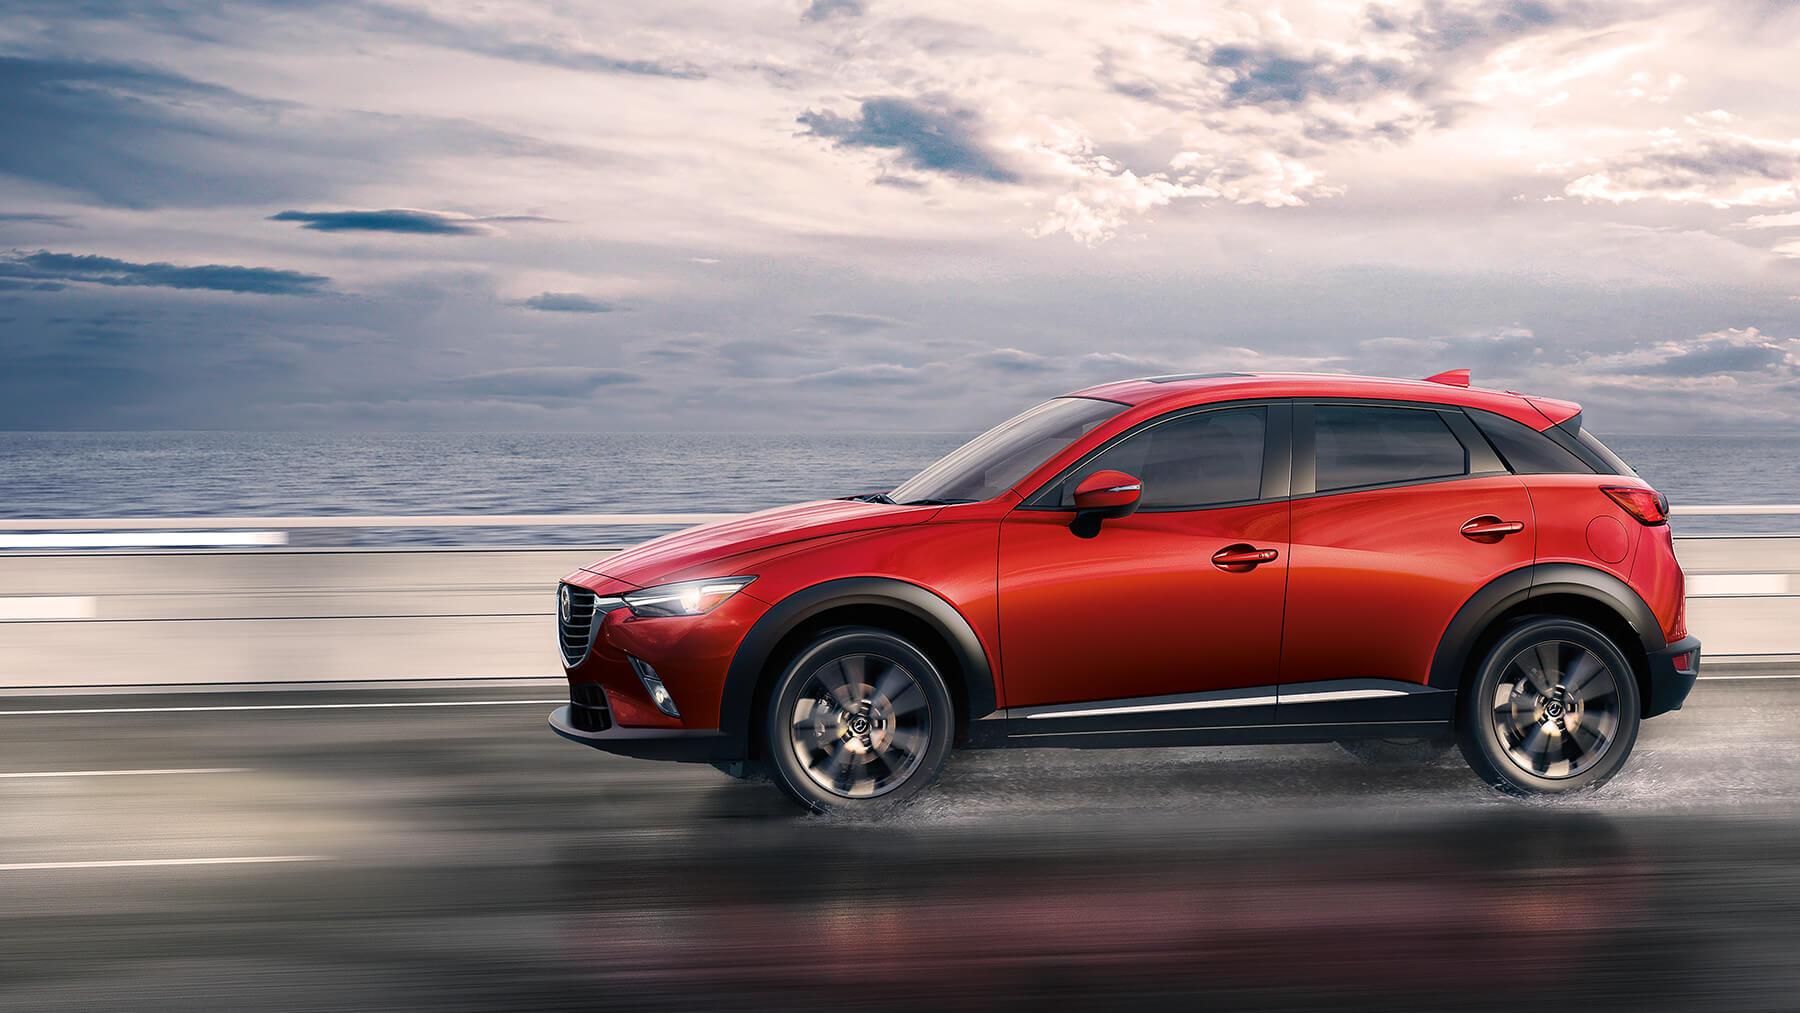 Performance and Fuel Economy